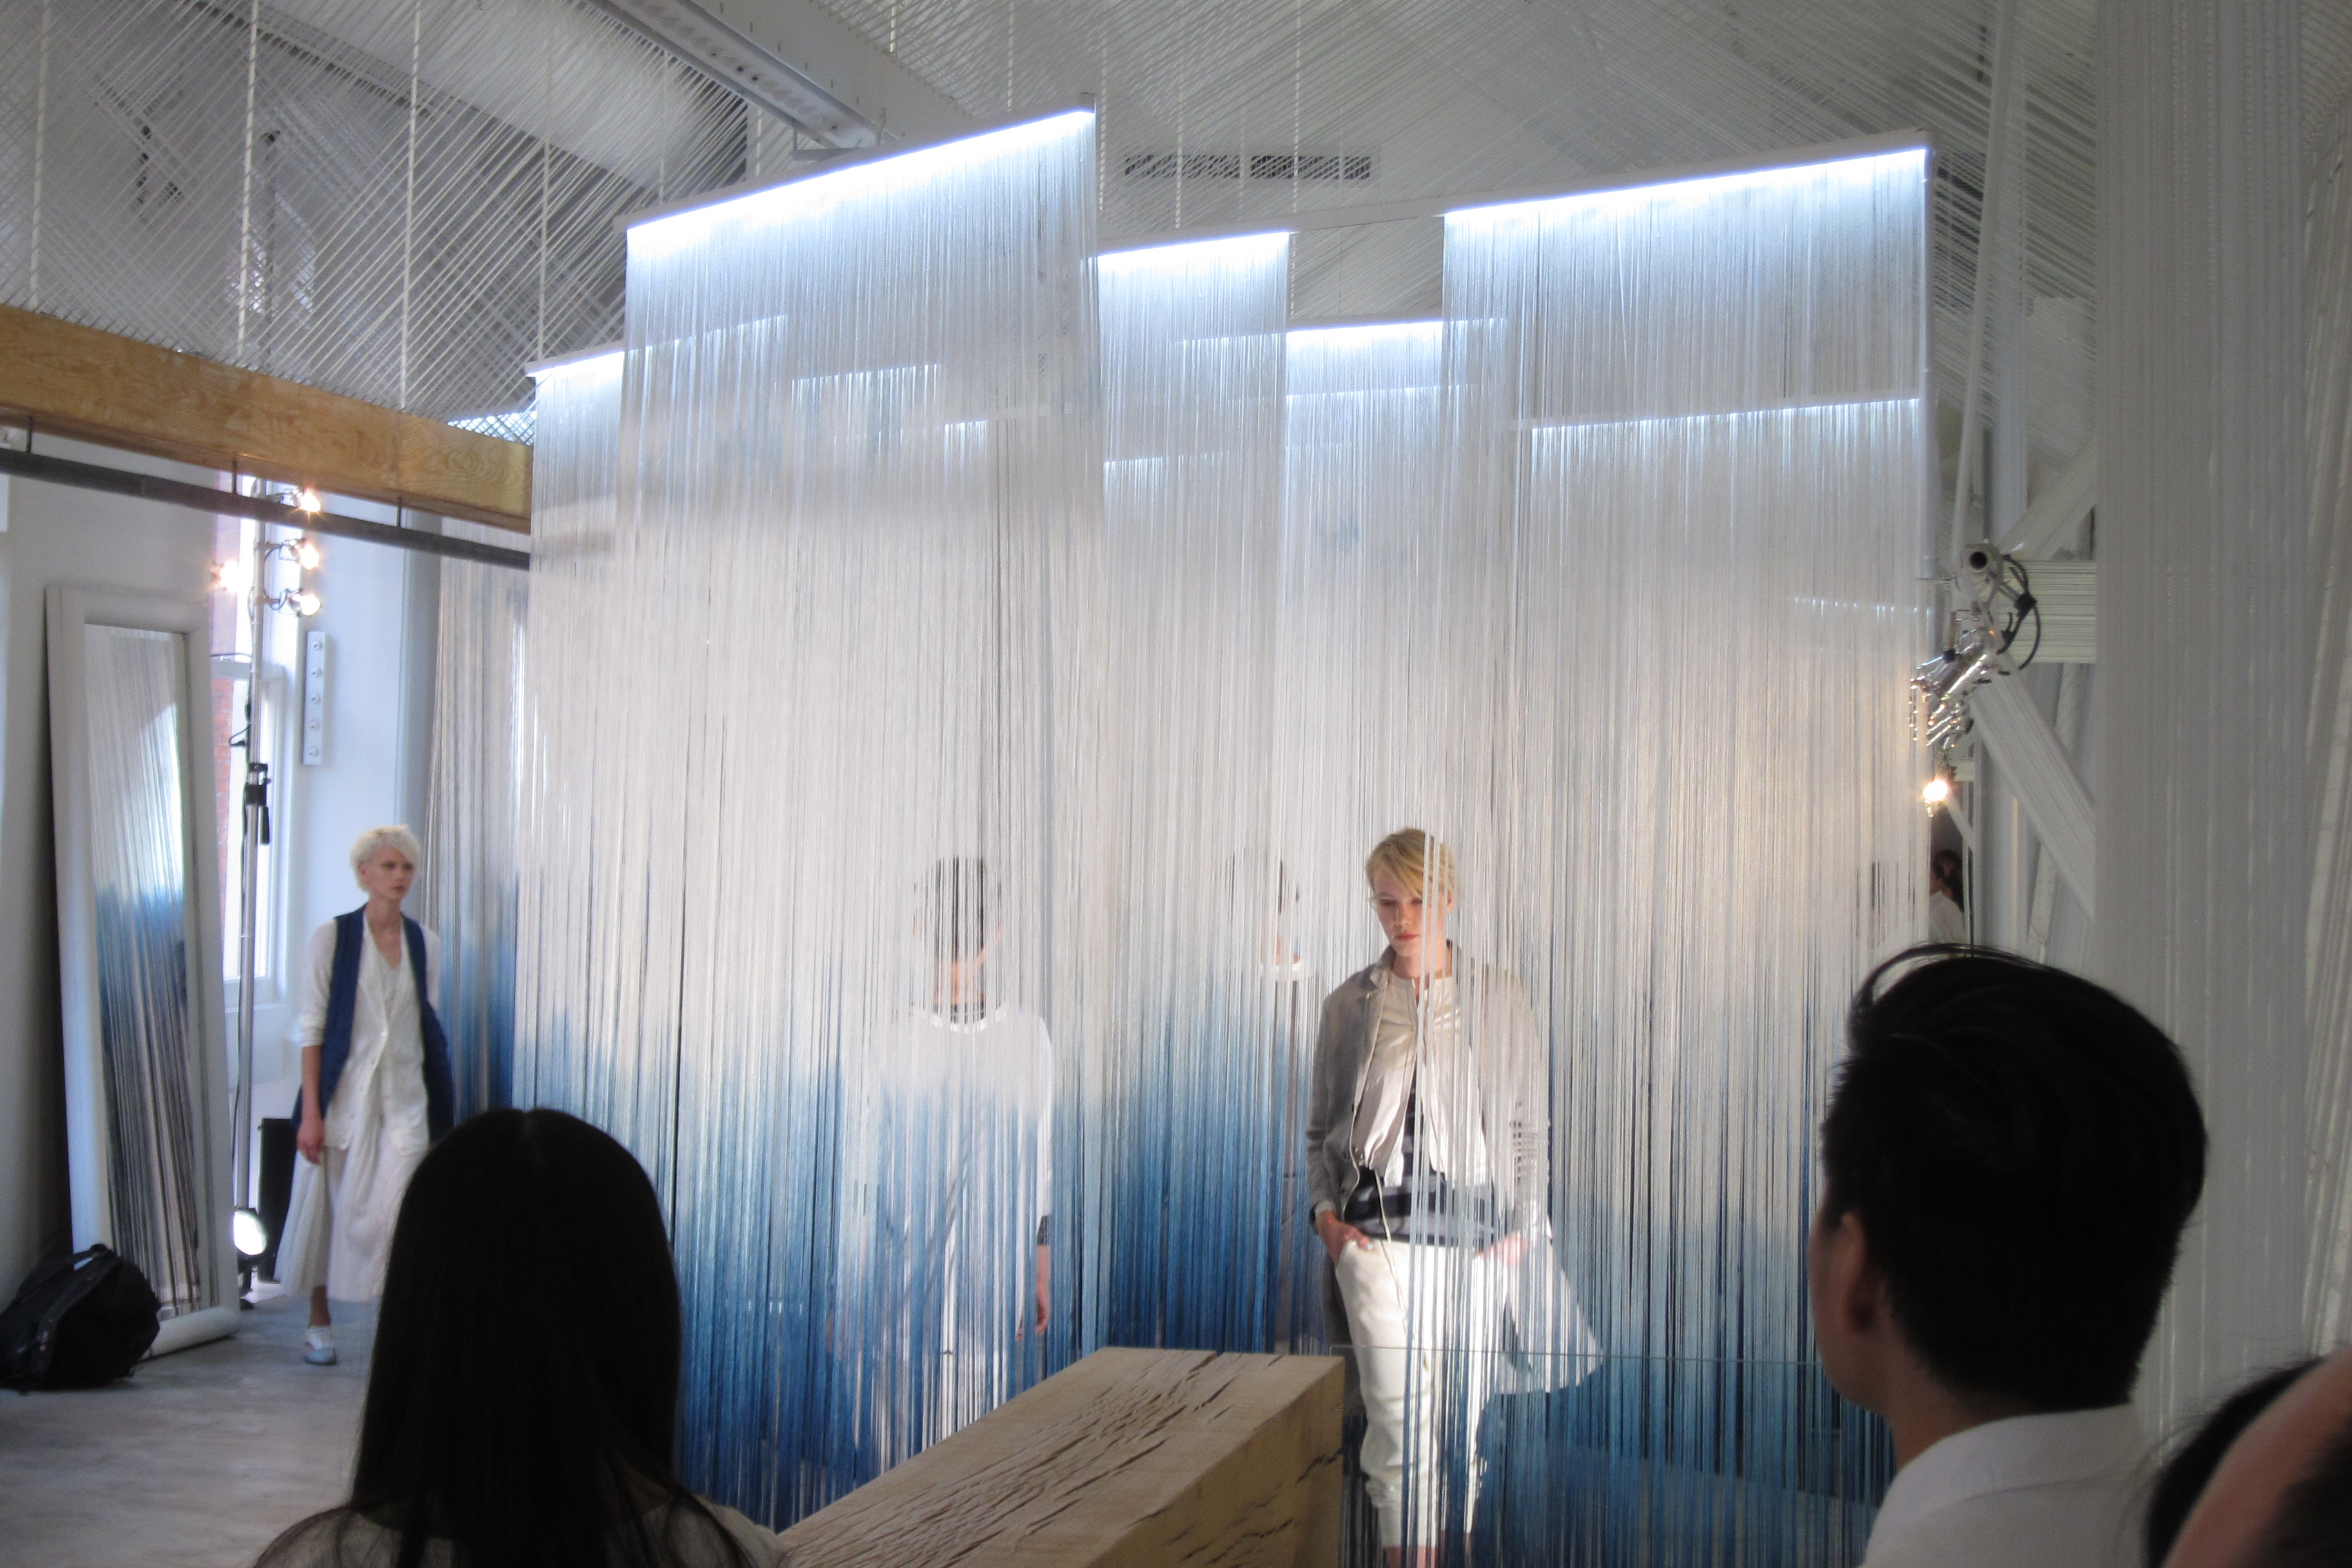 James clotfelter creates lighting installation for pas de calais sce